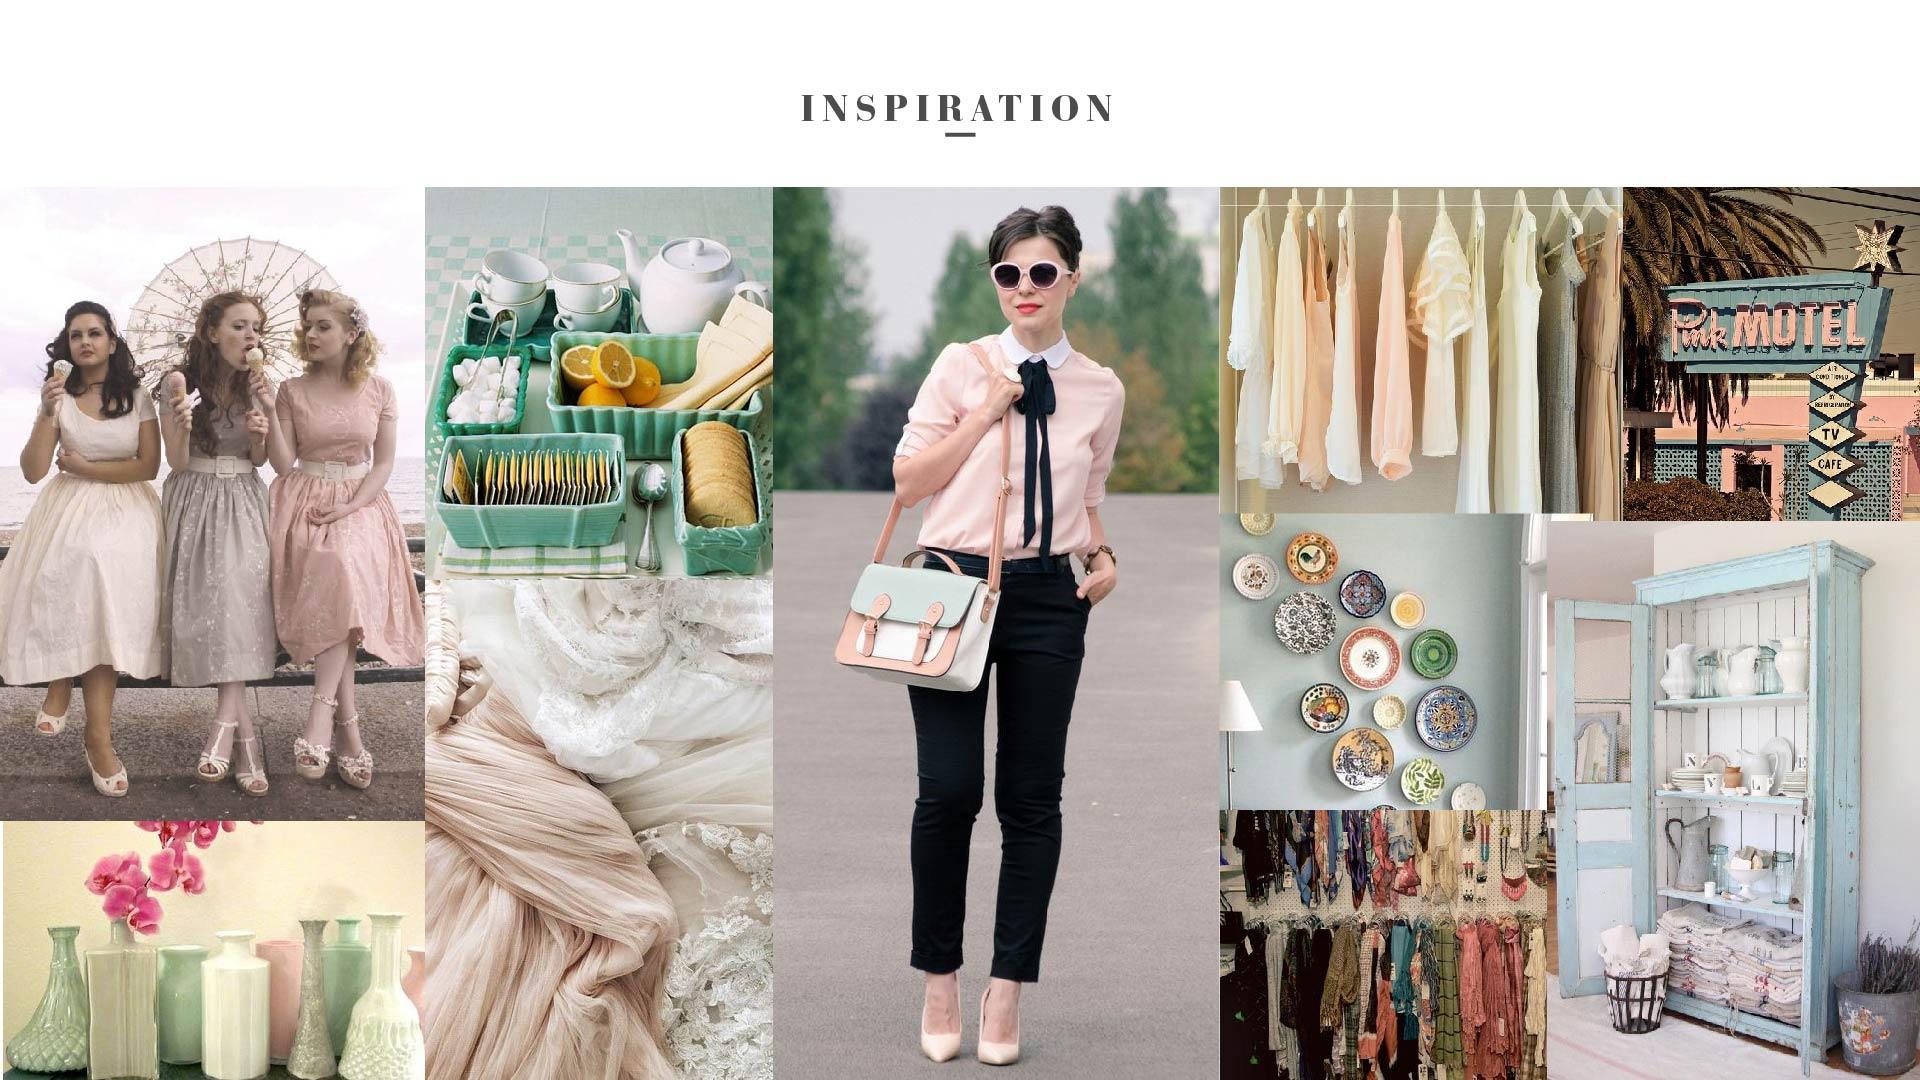 7 brand inspiration